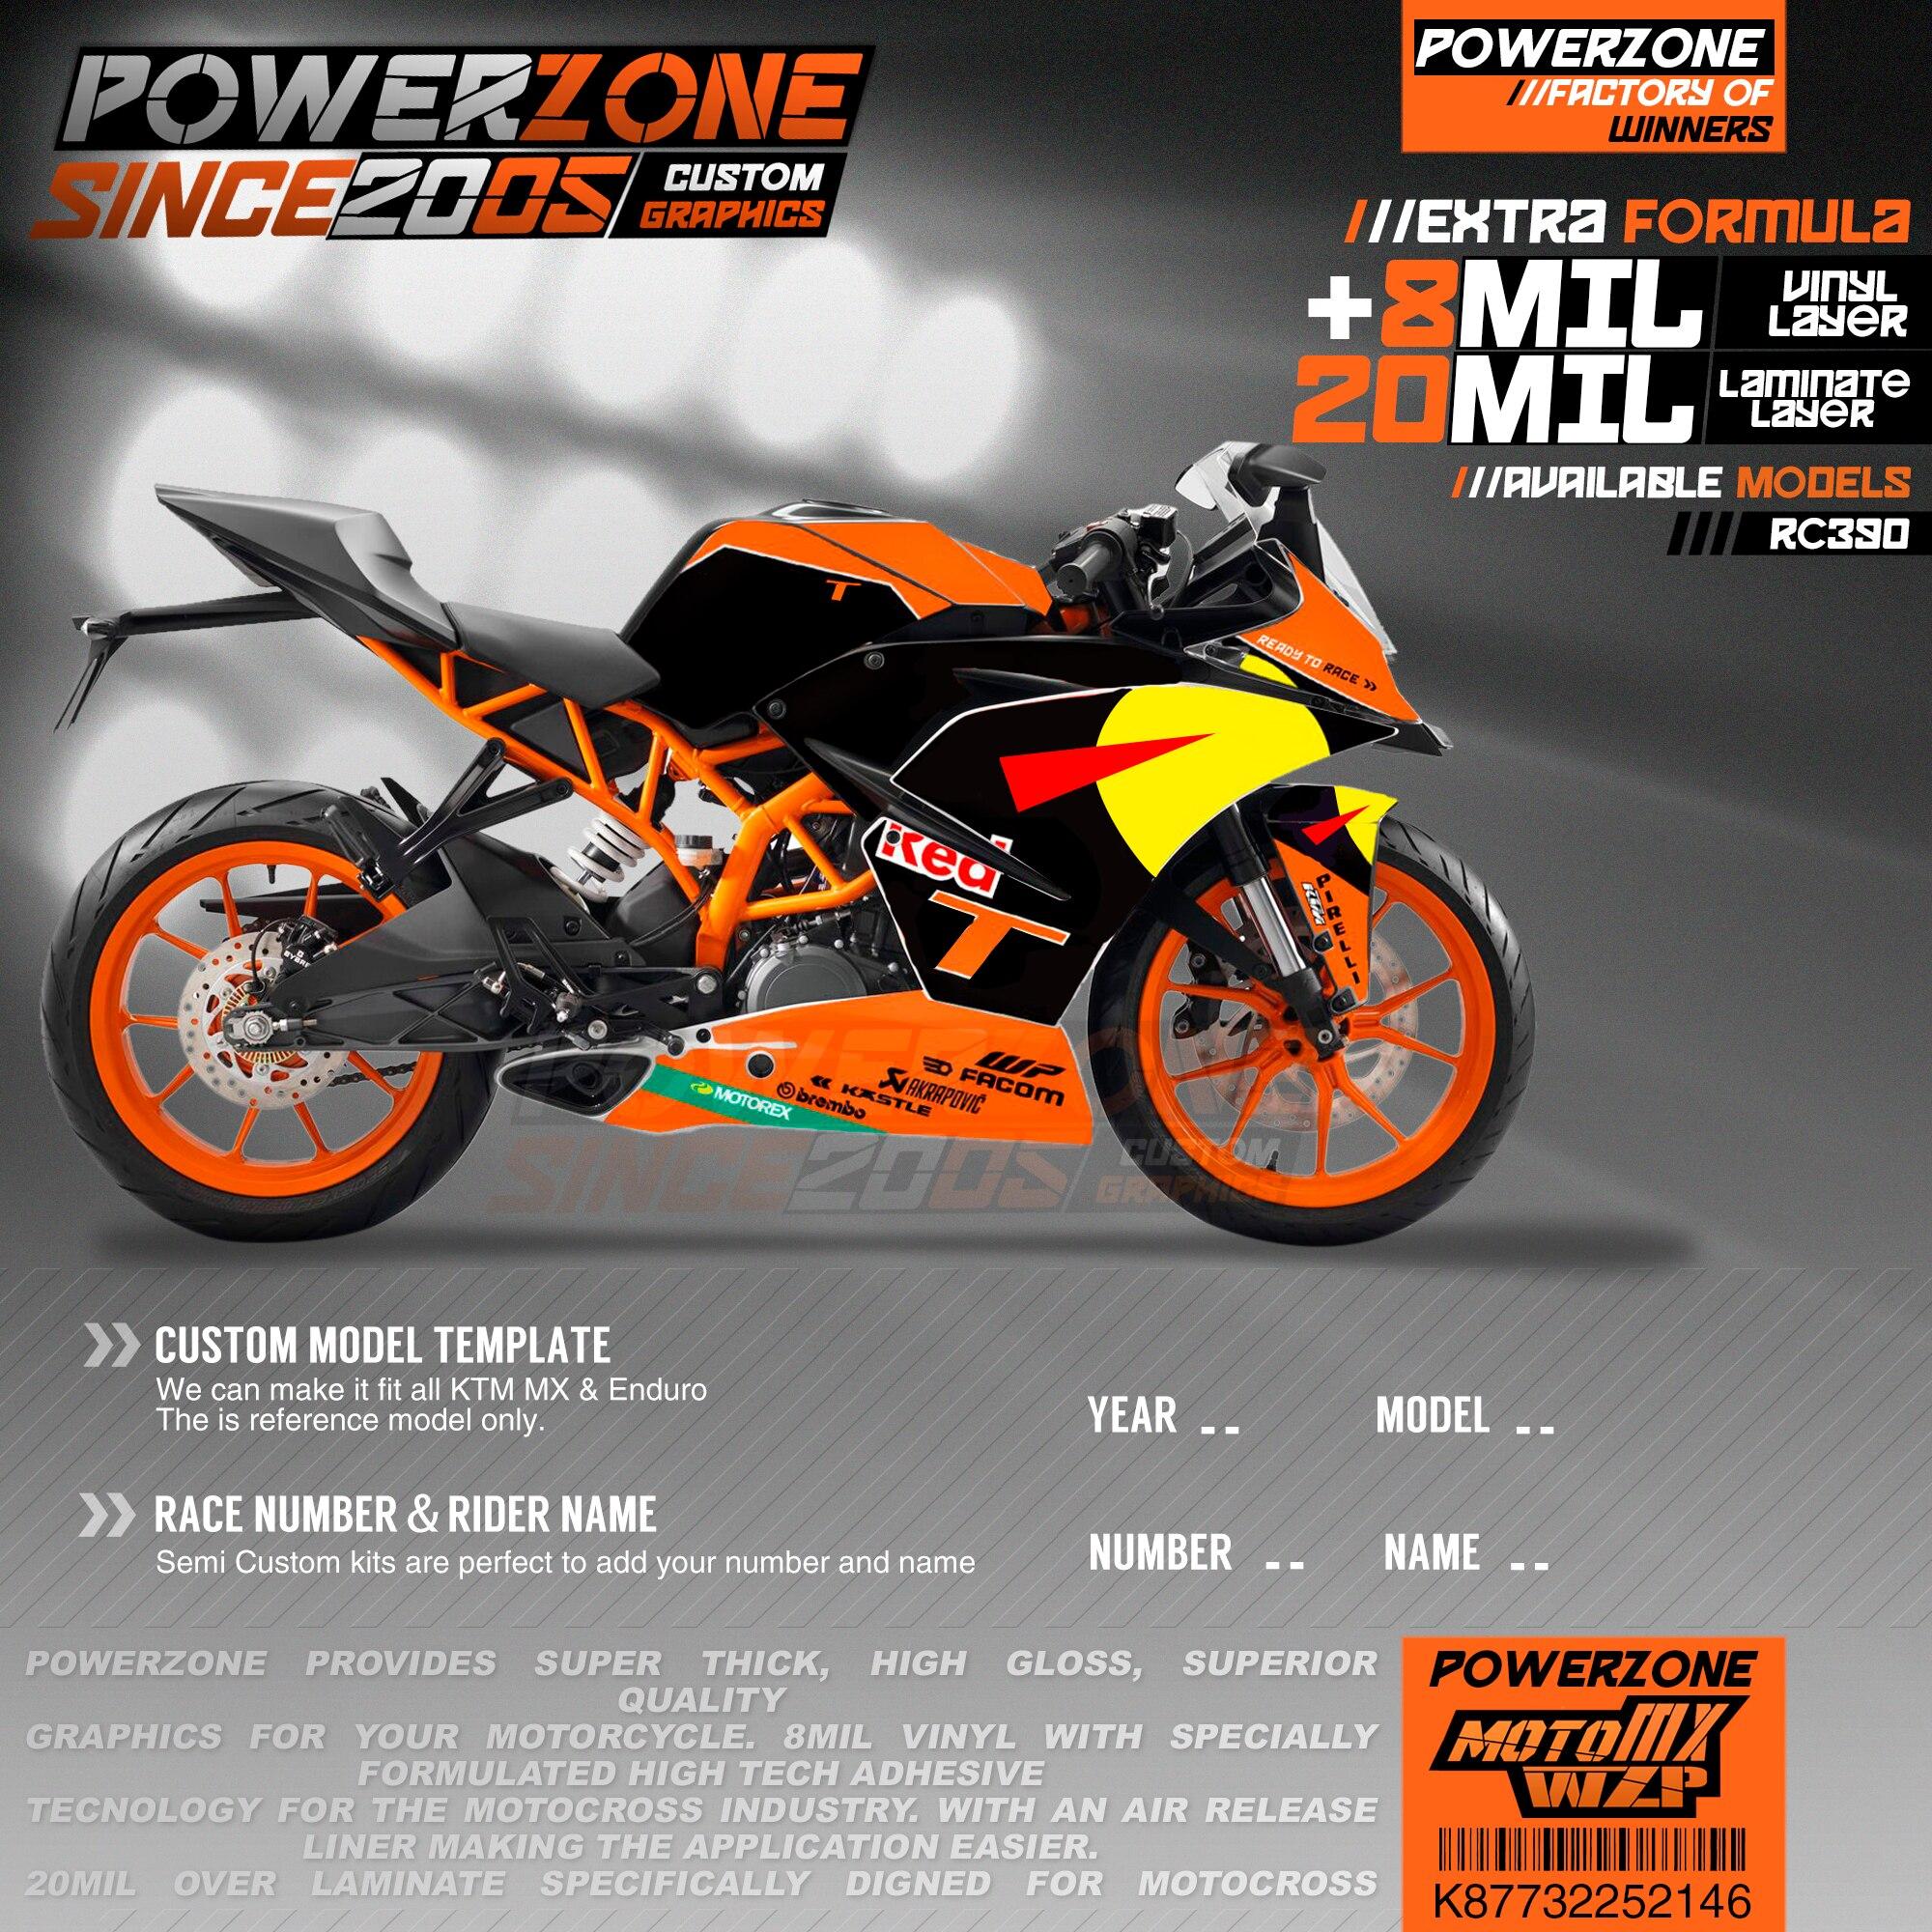 PowerZone equipo personalizado fondos gráficos calcomanías 3M pegatinas Kit para KTM RC390 2014-2016 2017-2019 146